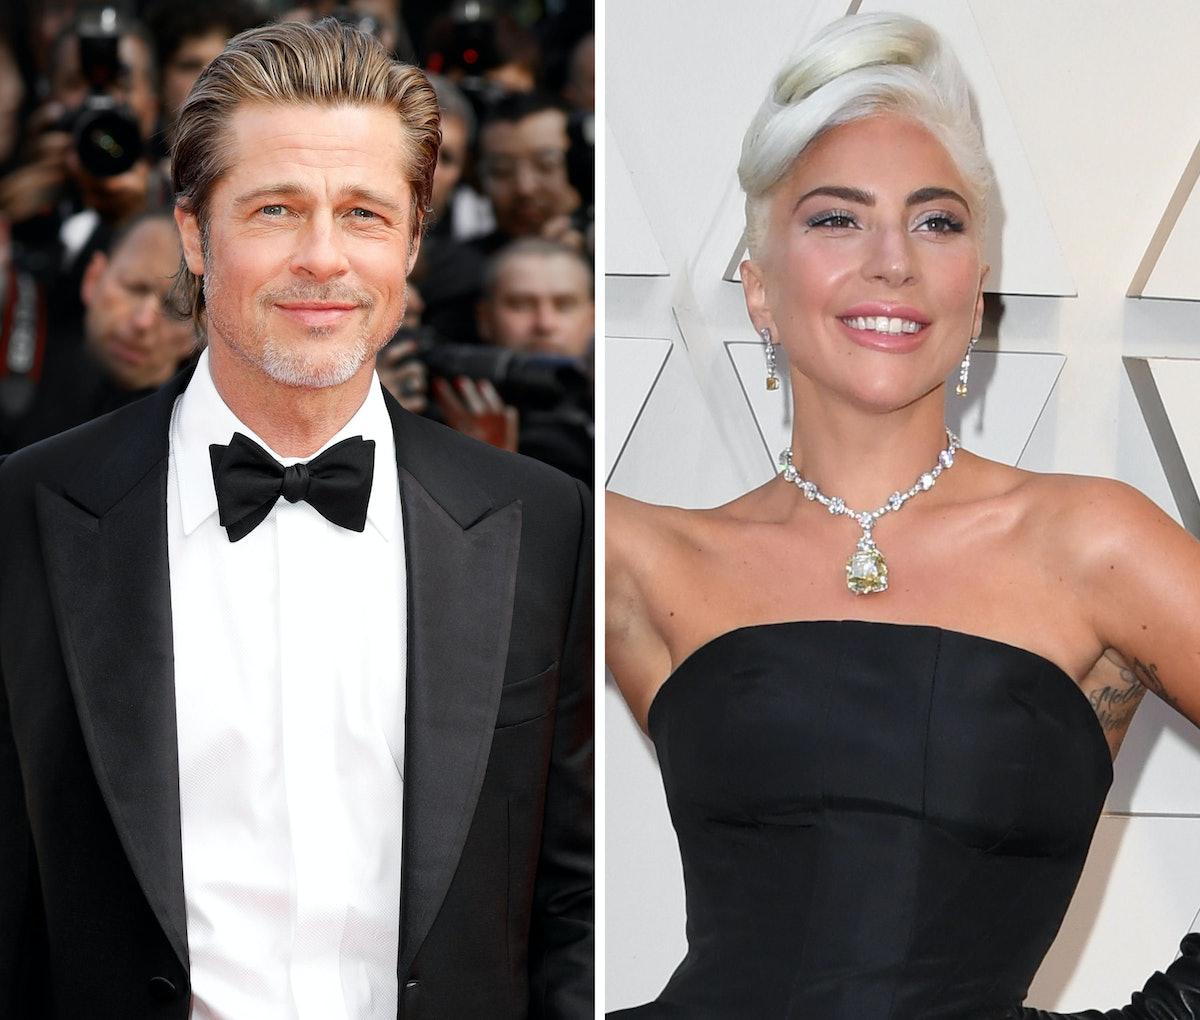 Brad Pitt and Lady Gaga